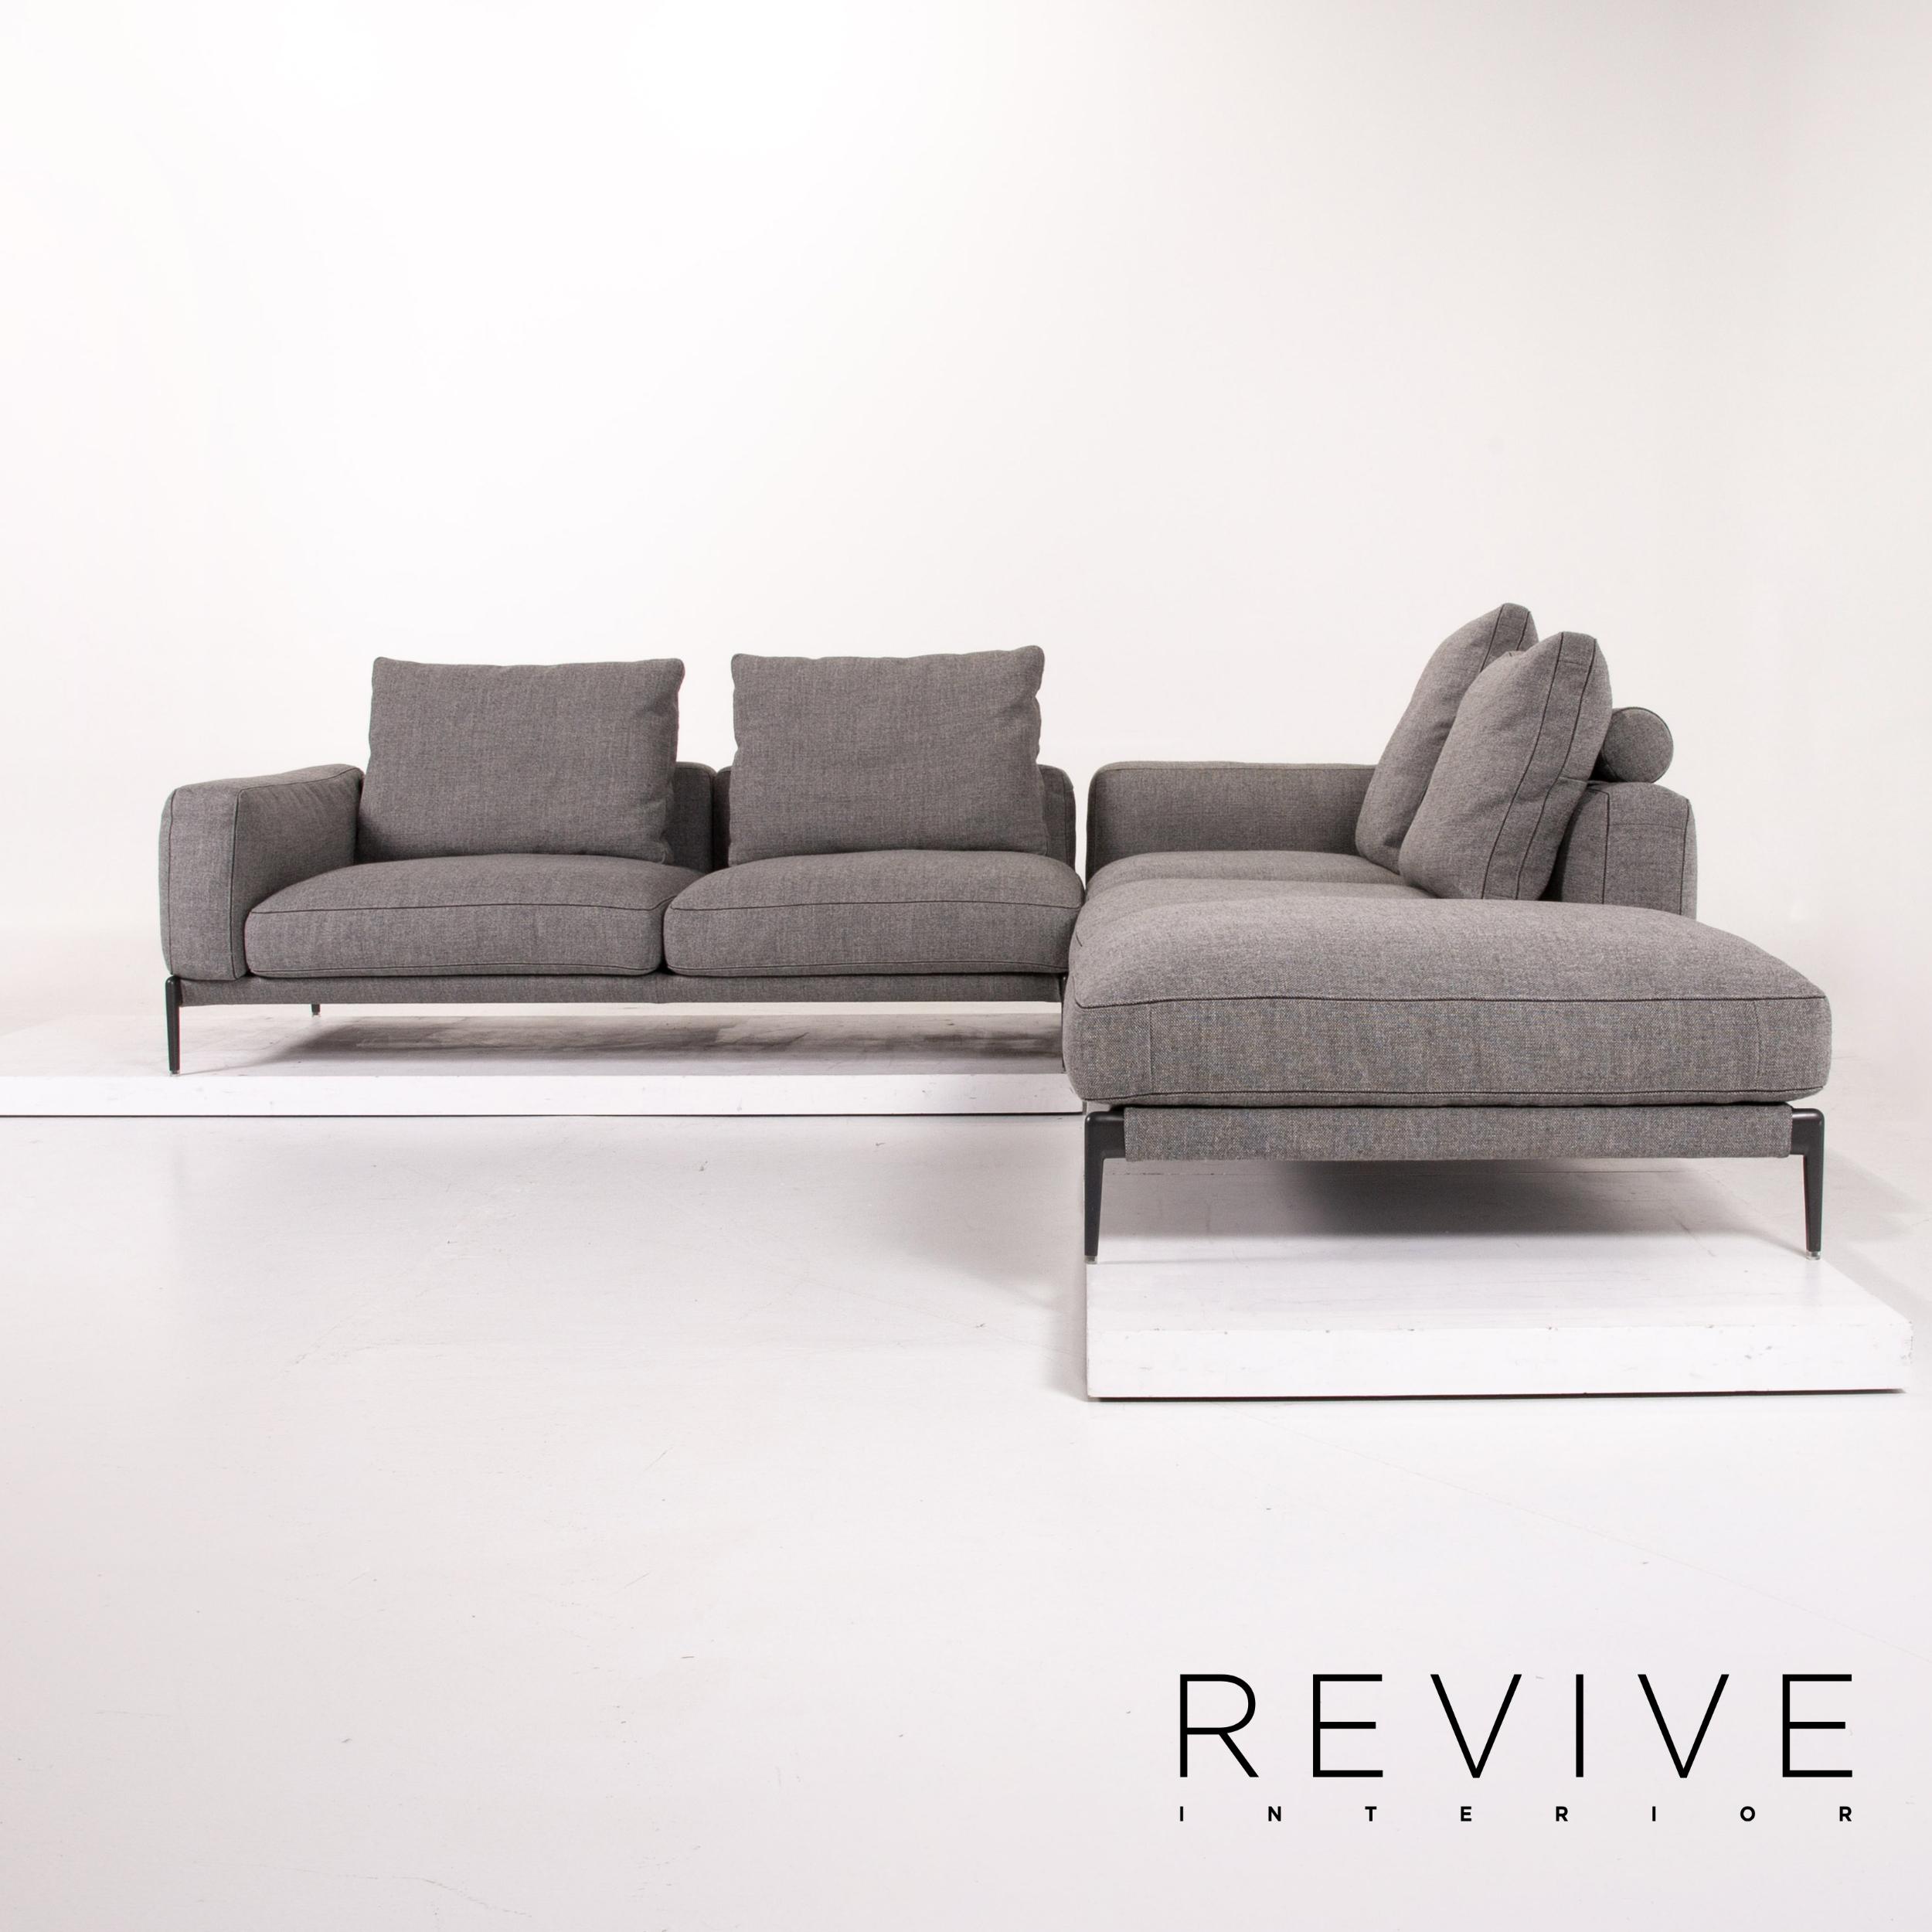 Flexform Romeo Stoff Ecksofa Grau Sofa Couch #13740   eBay